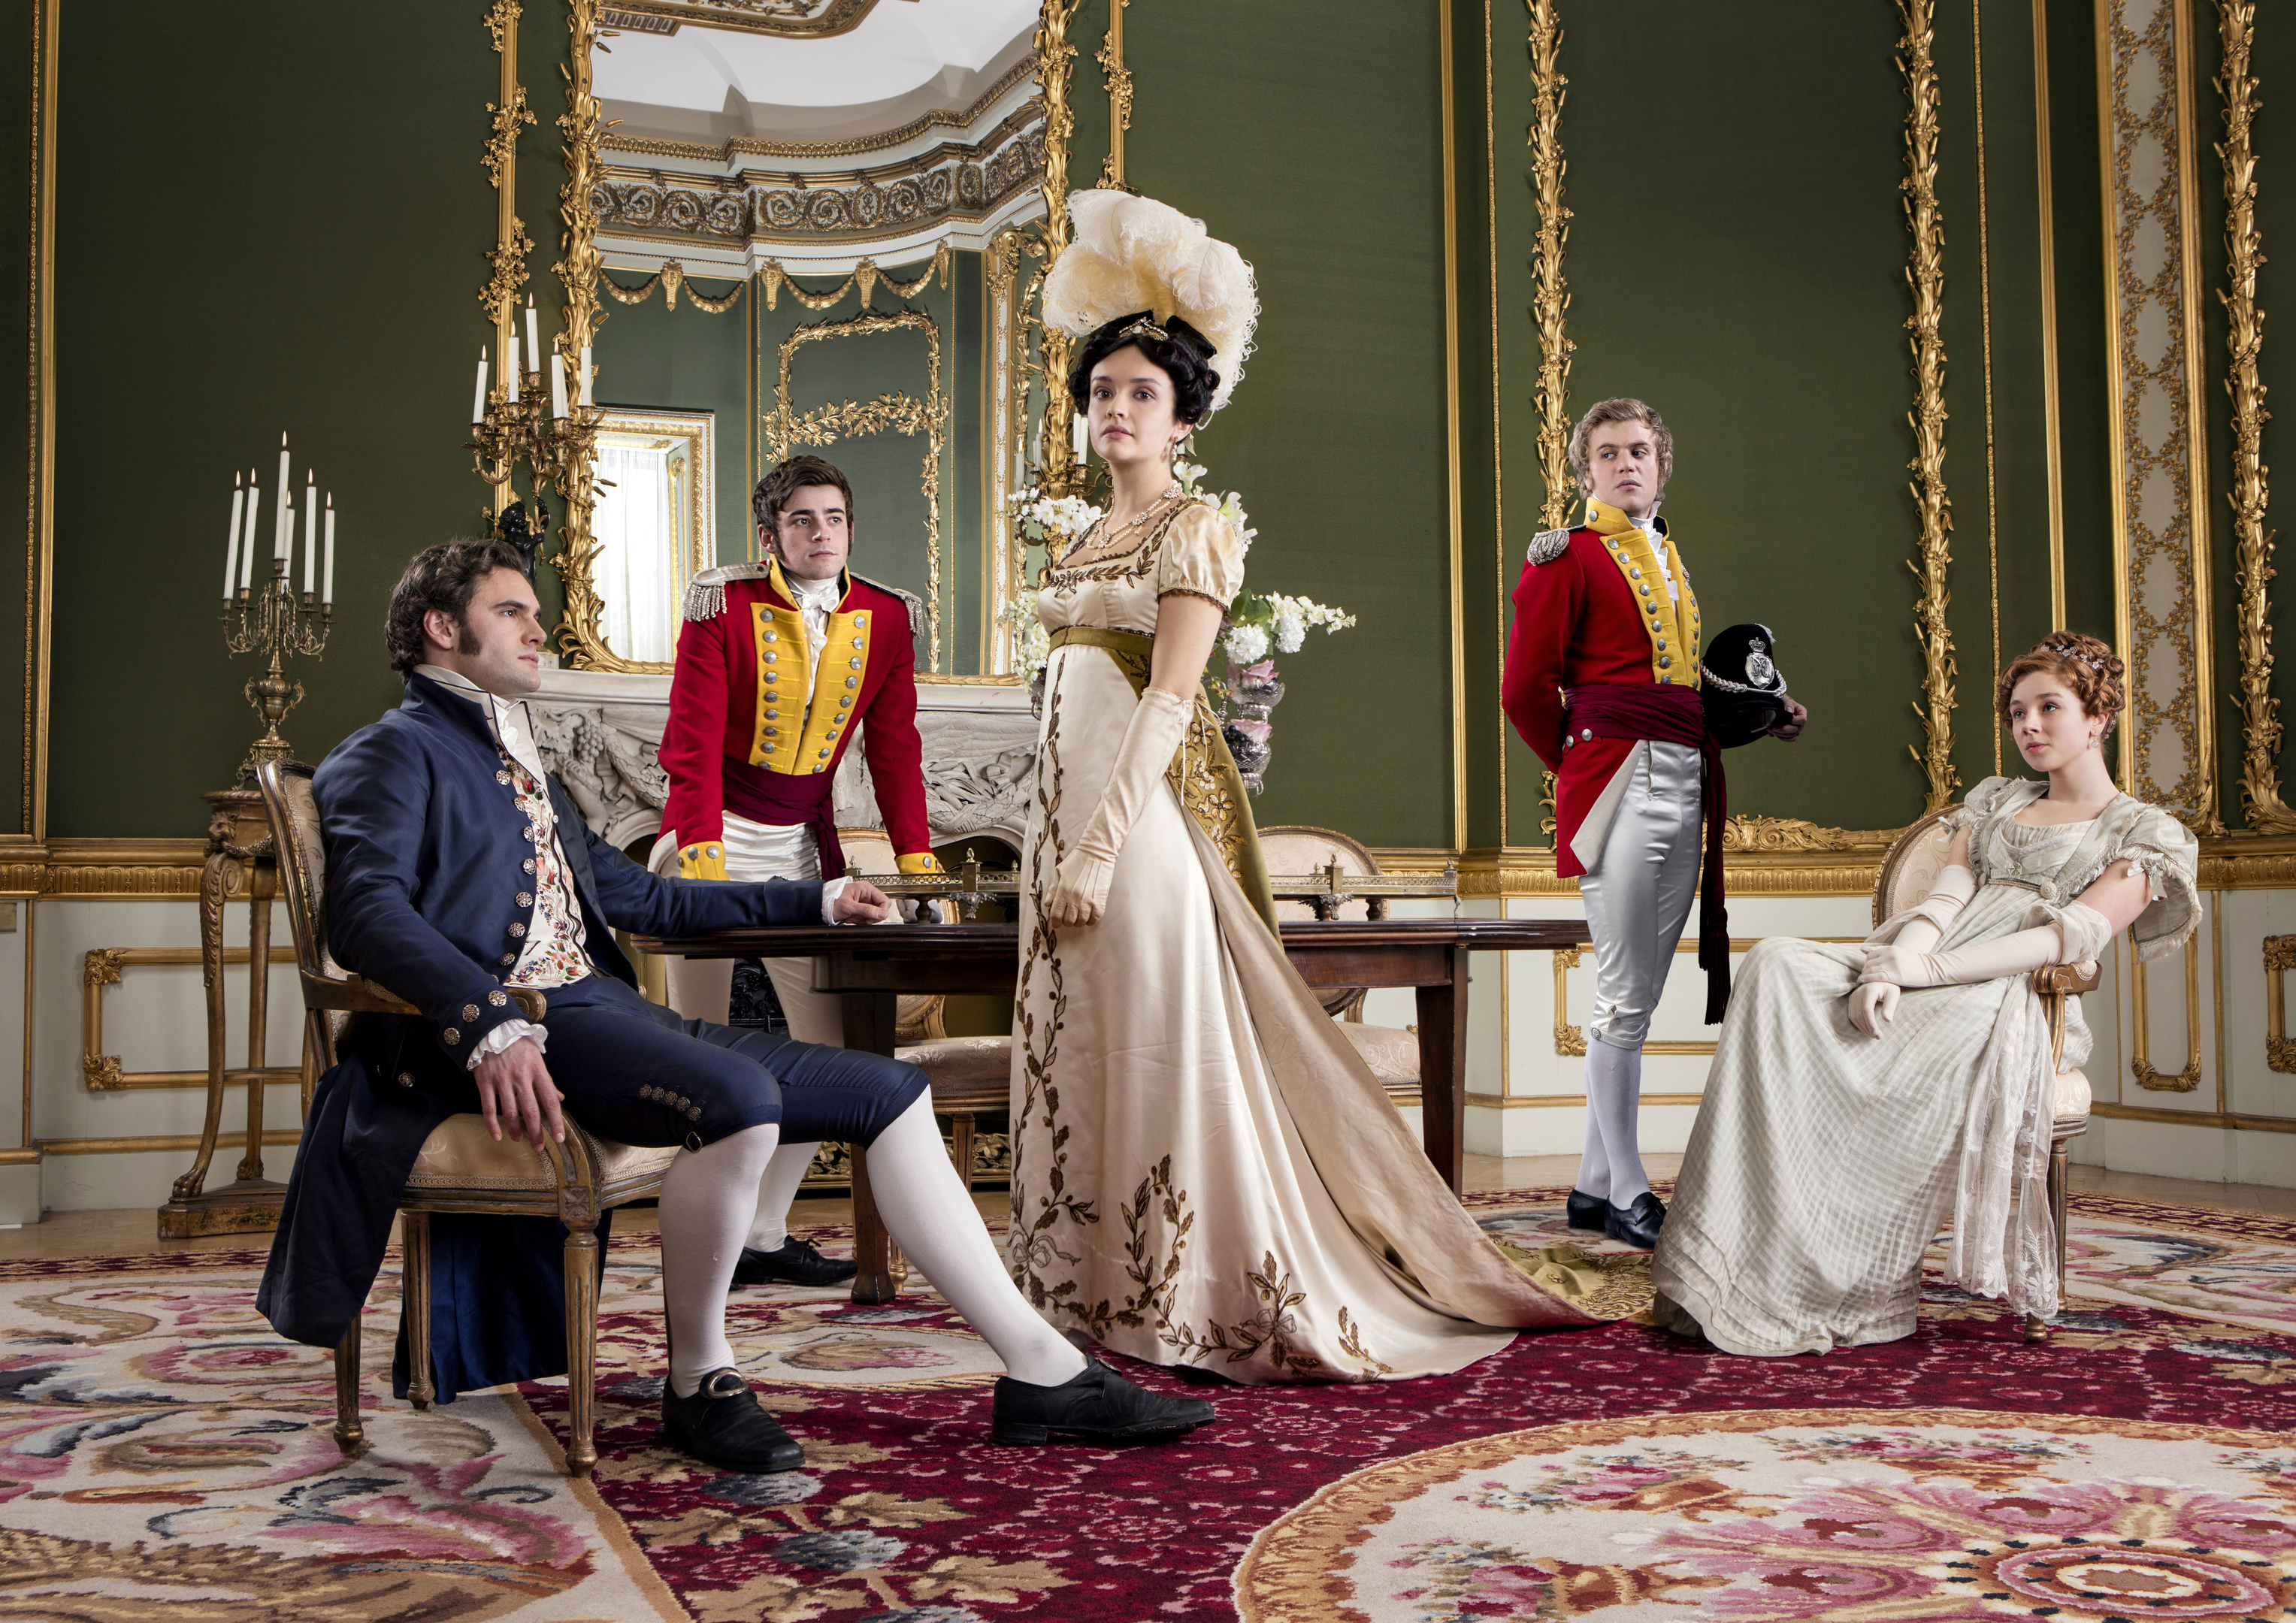 Vanity Fair starts on ITV on 2 September (ITV)